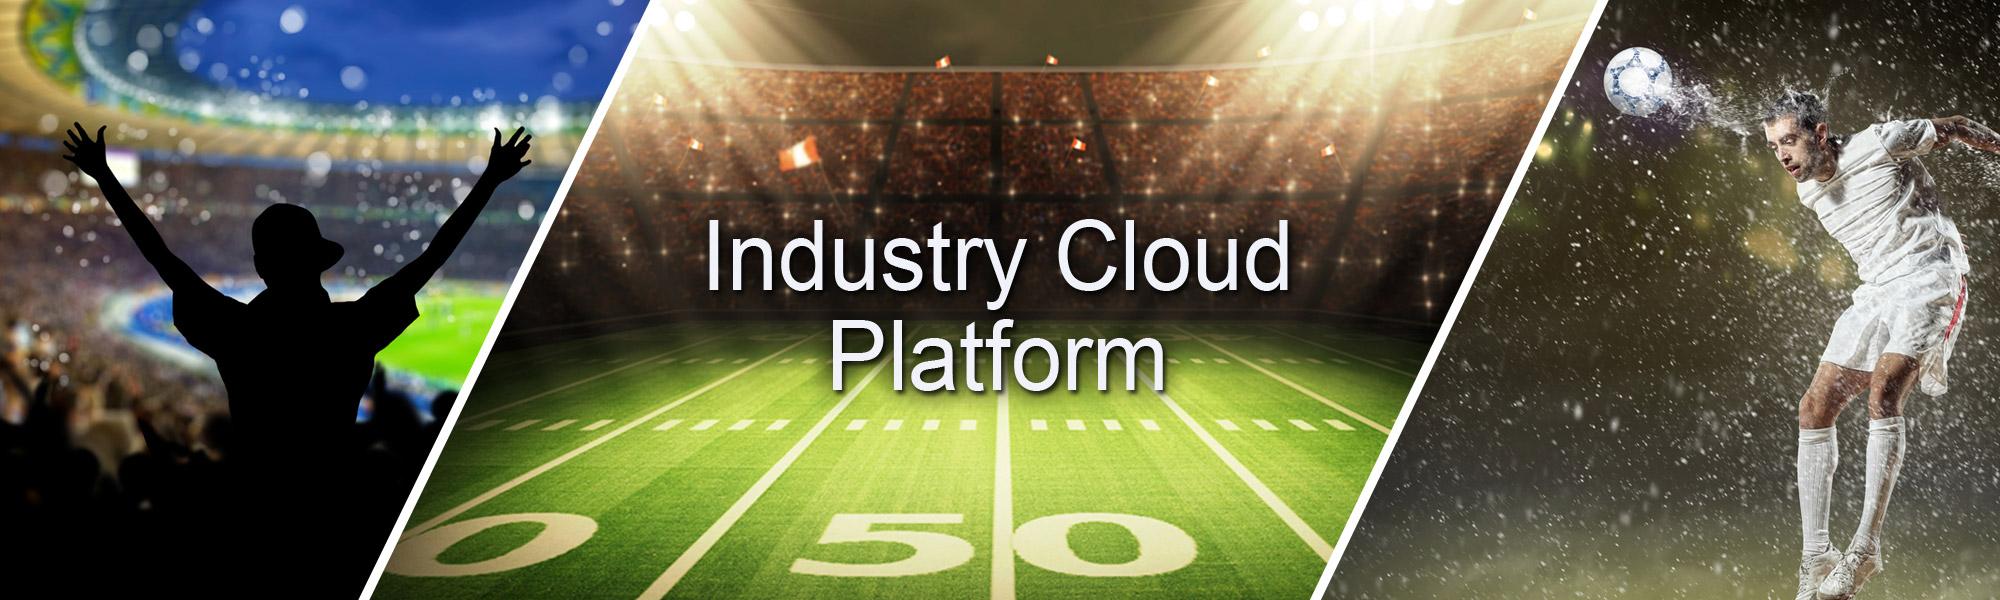 Industry Cloud Platform